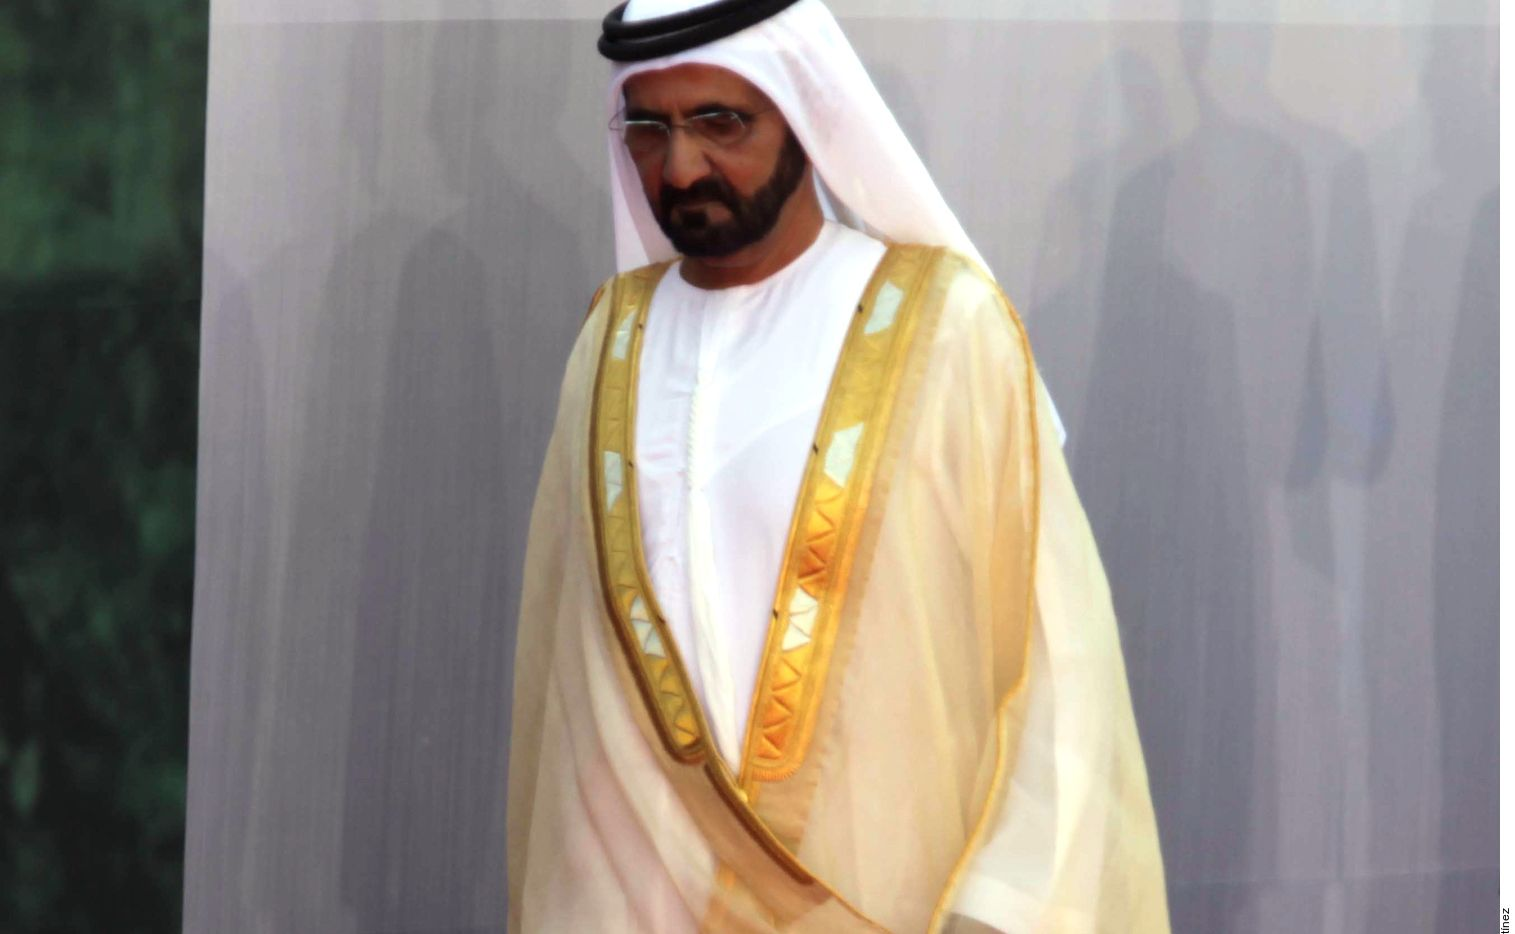 El Jeque Mohamed bin Rashid, de Dubái, suma 3,898 millones de dólares.